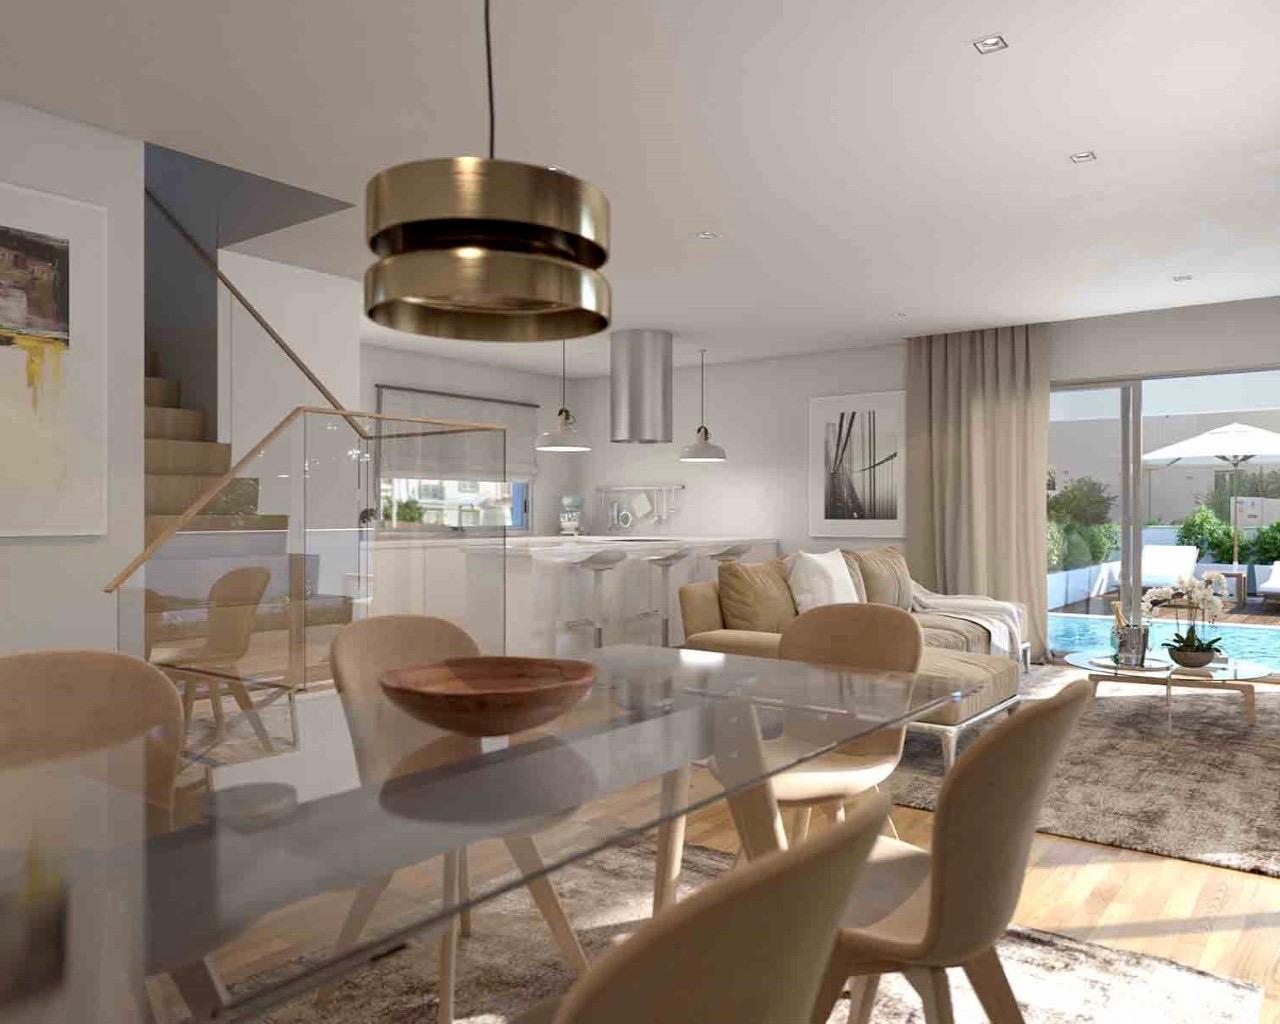 Algarve Villa contemporaine de 3 chambres avec piscine individuelle, terrasses à Ferragudo  - Ferragudo